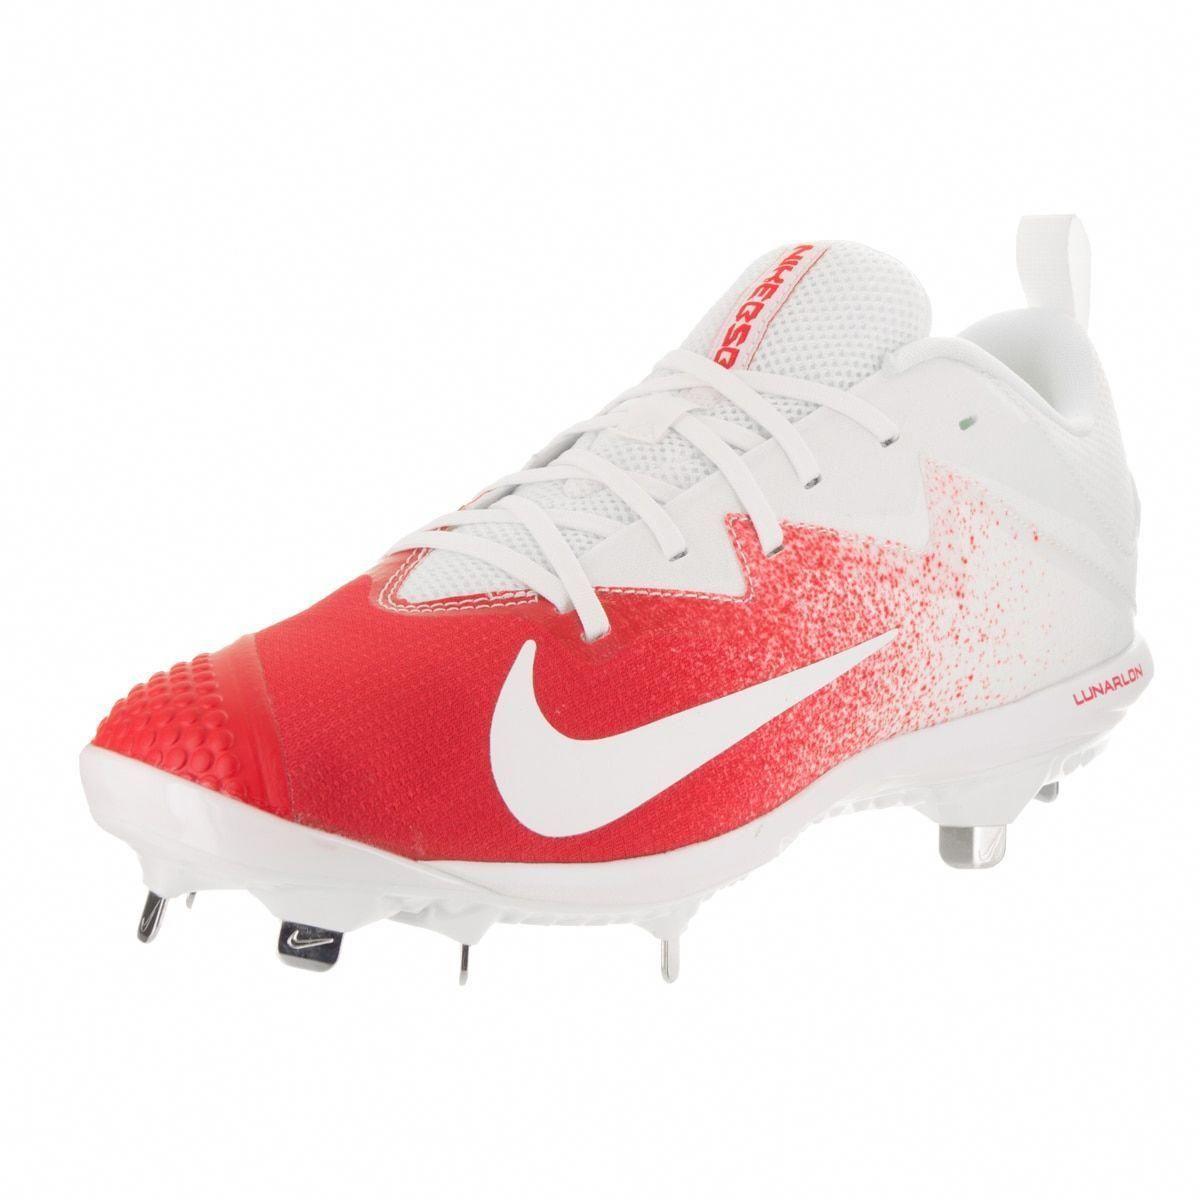 watch f6dcc 1ef26 Nike Men s Lunar Vapor Ultrafly Pro Baseball Cleat (7.5), White   baseballcleats